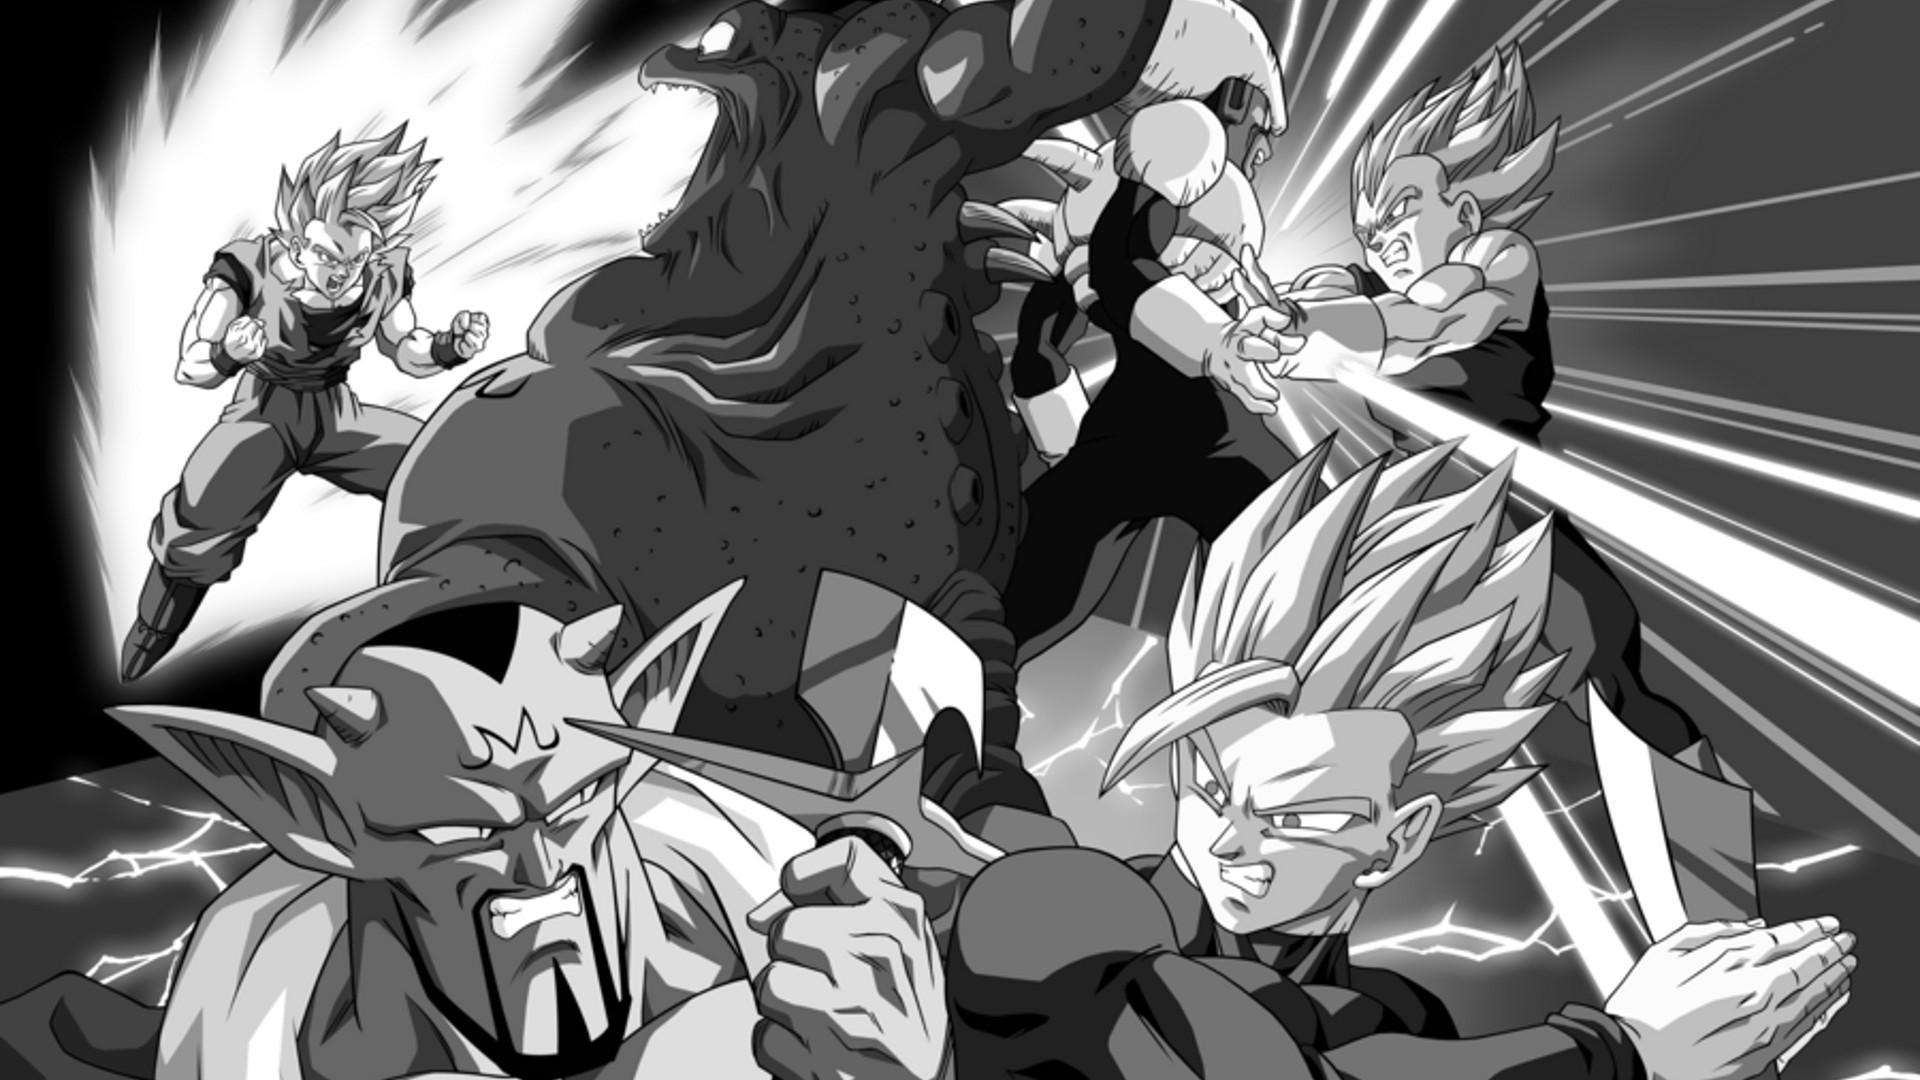 illustration monochrome anime cartoon Dragon Ball Z comics sketch black and white monochrome photography mangaka comics artist comic book 174489